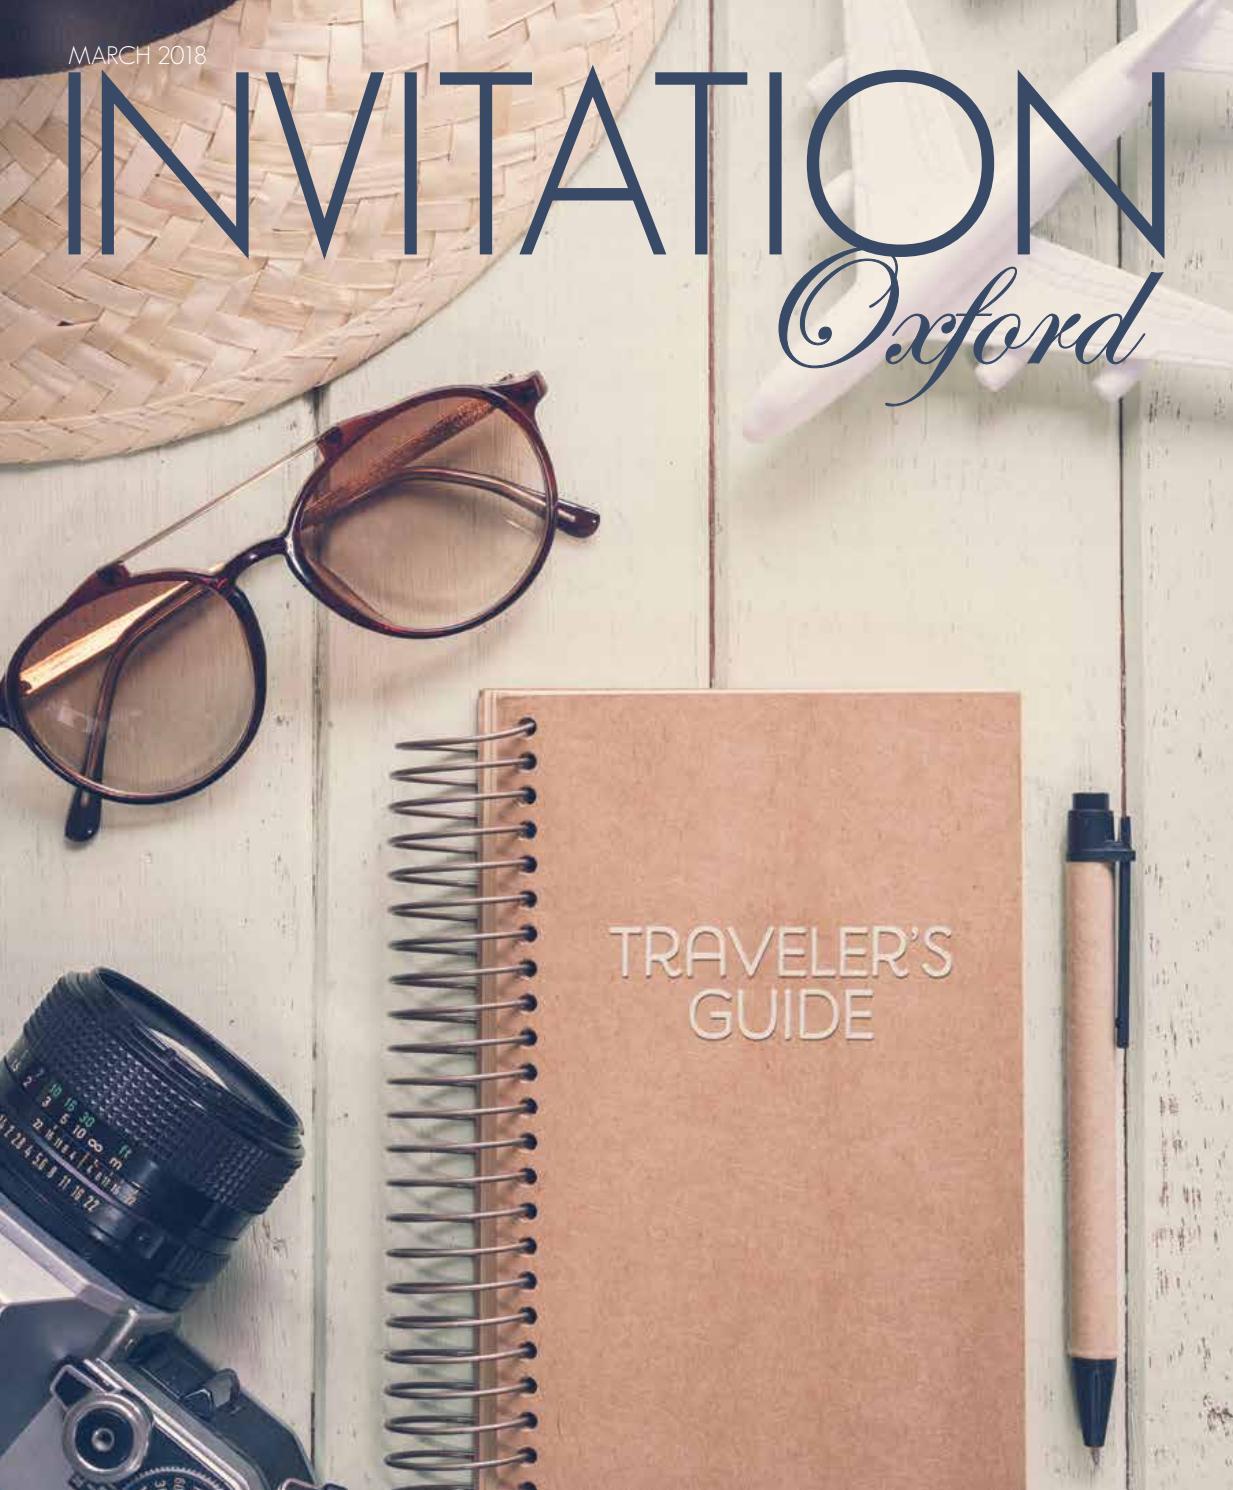 Invitation Oxford - March 2018 by Invitation Magazines - Issuu